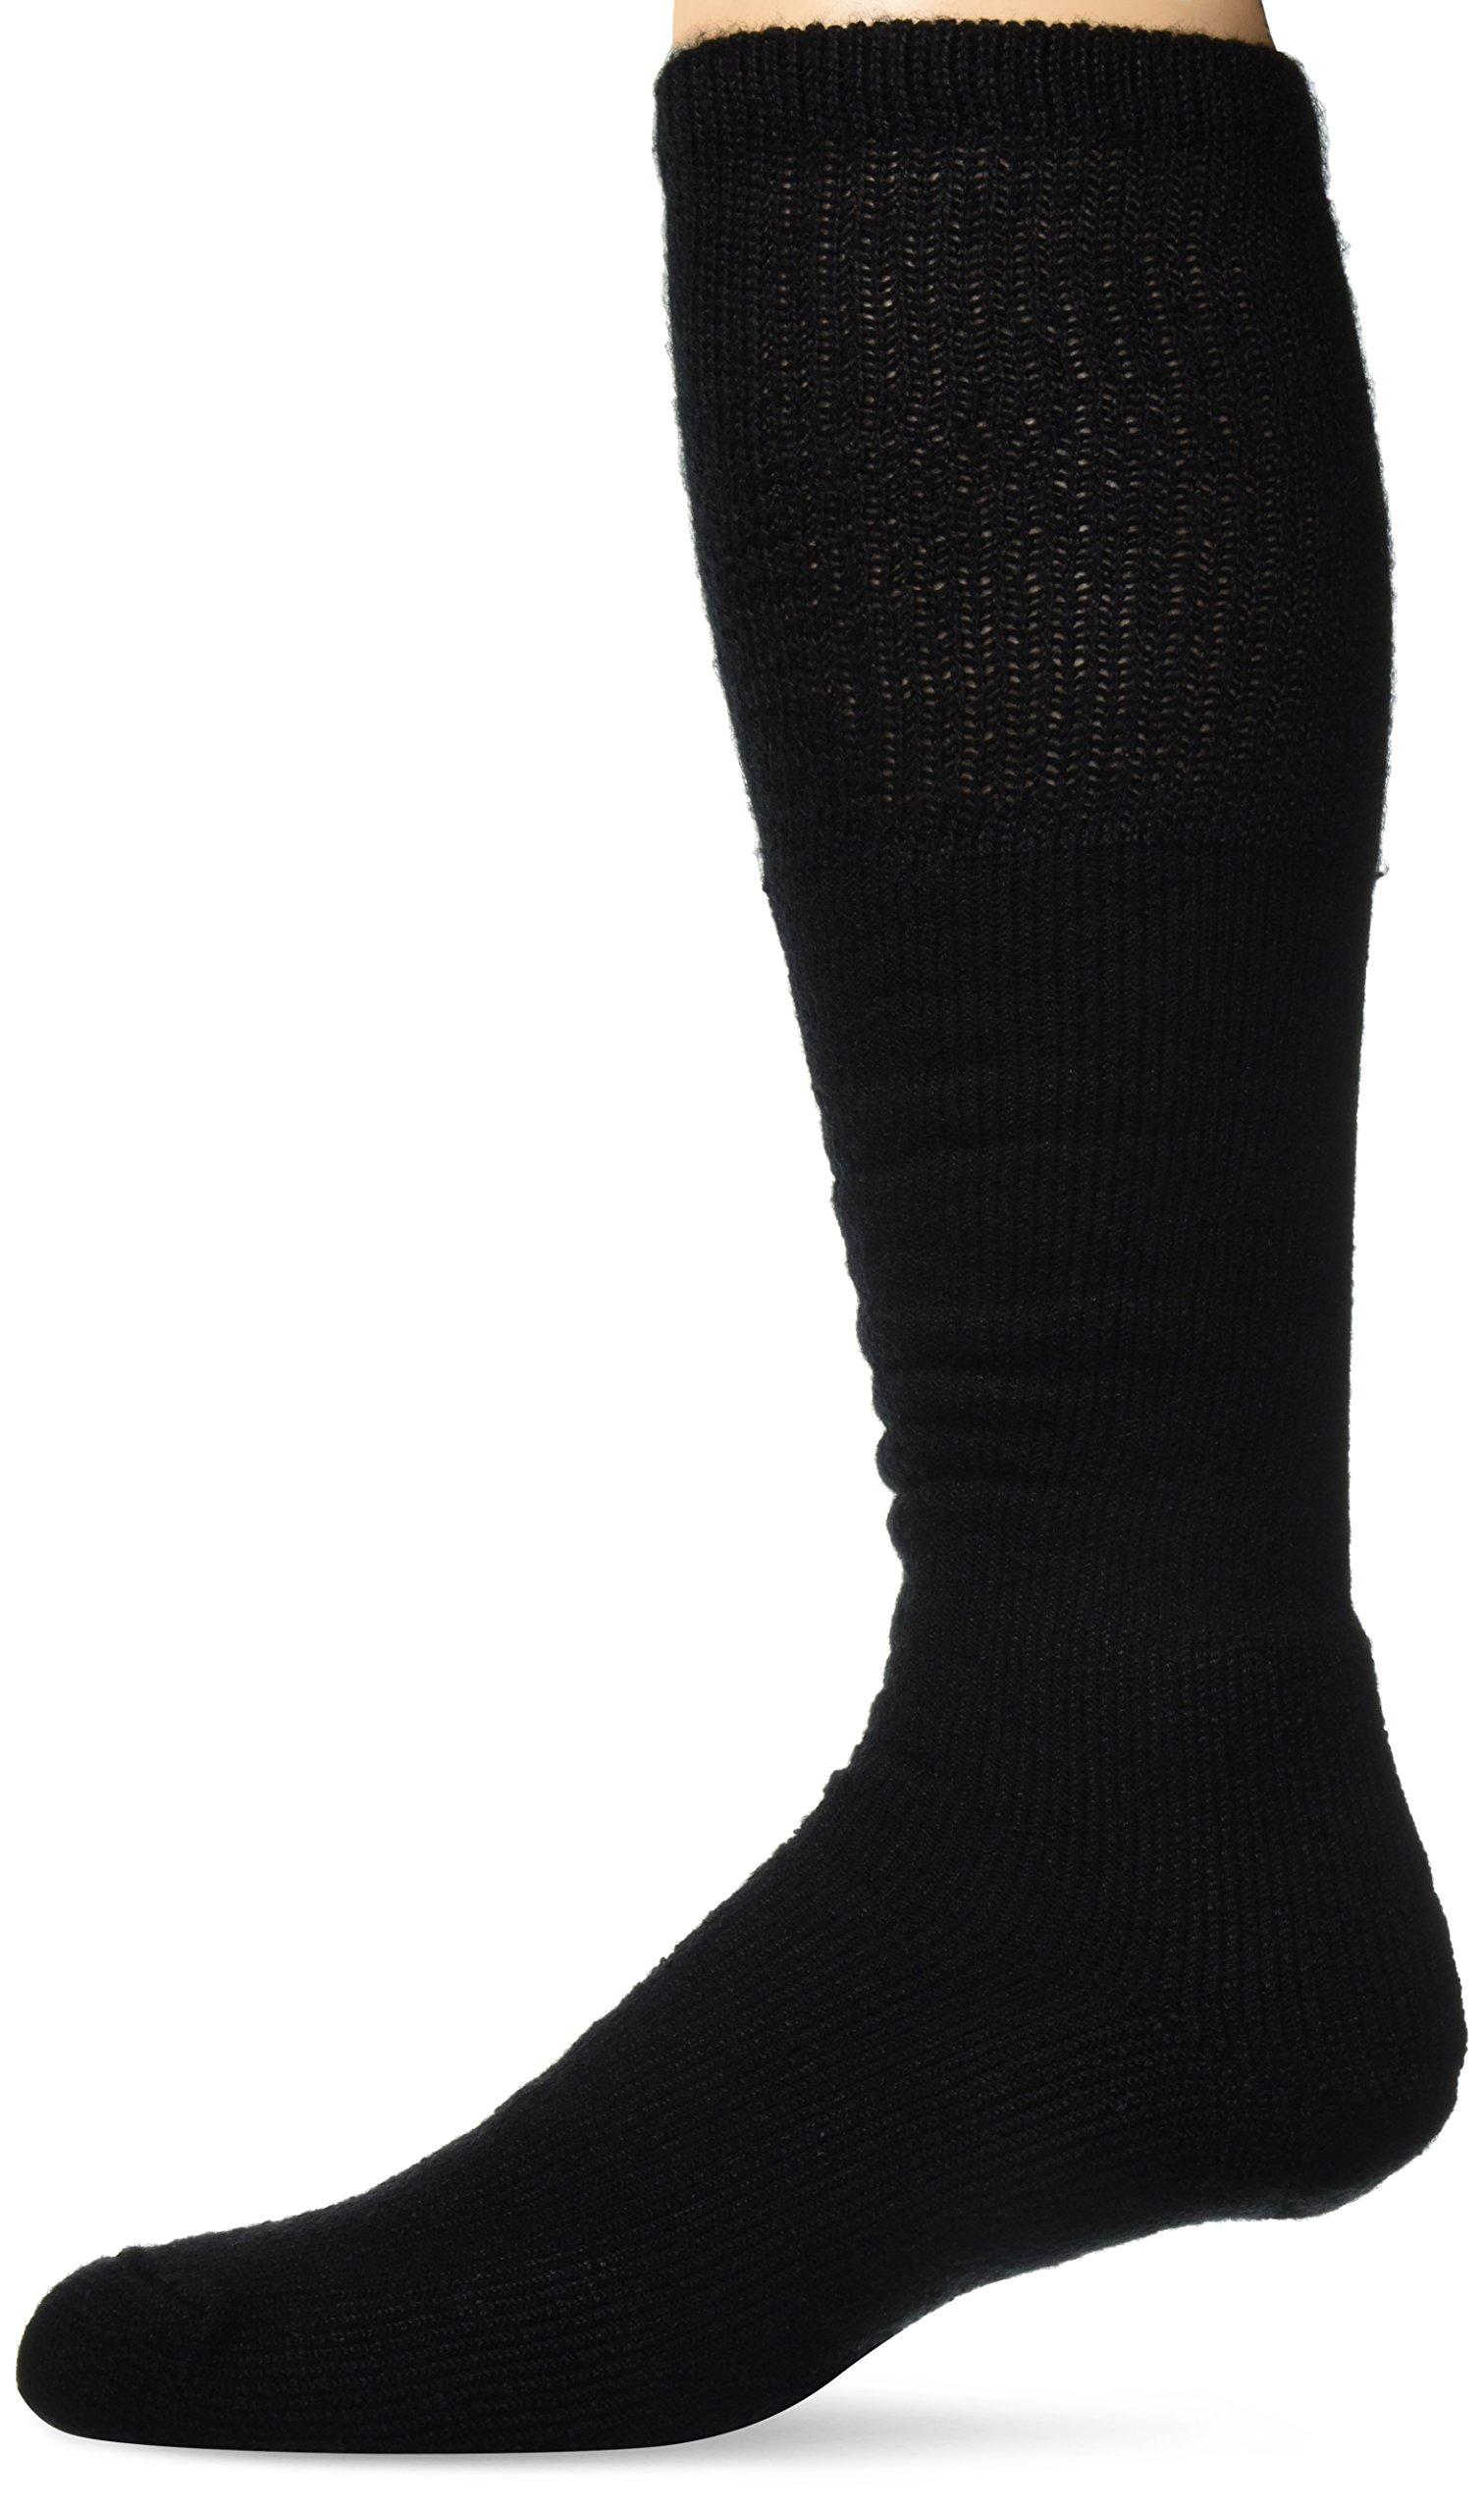 Thorlos Unisex WBO Work Thick Padded Over the Calf Sock, Black, Large